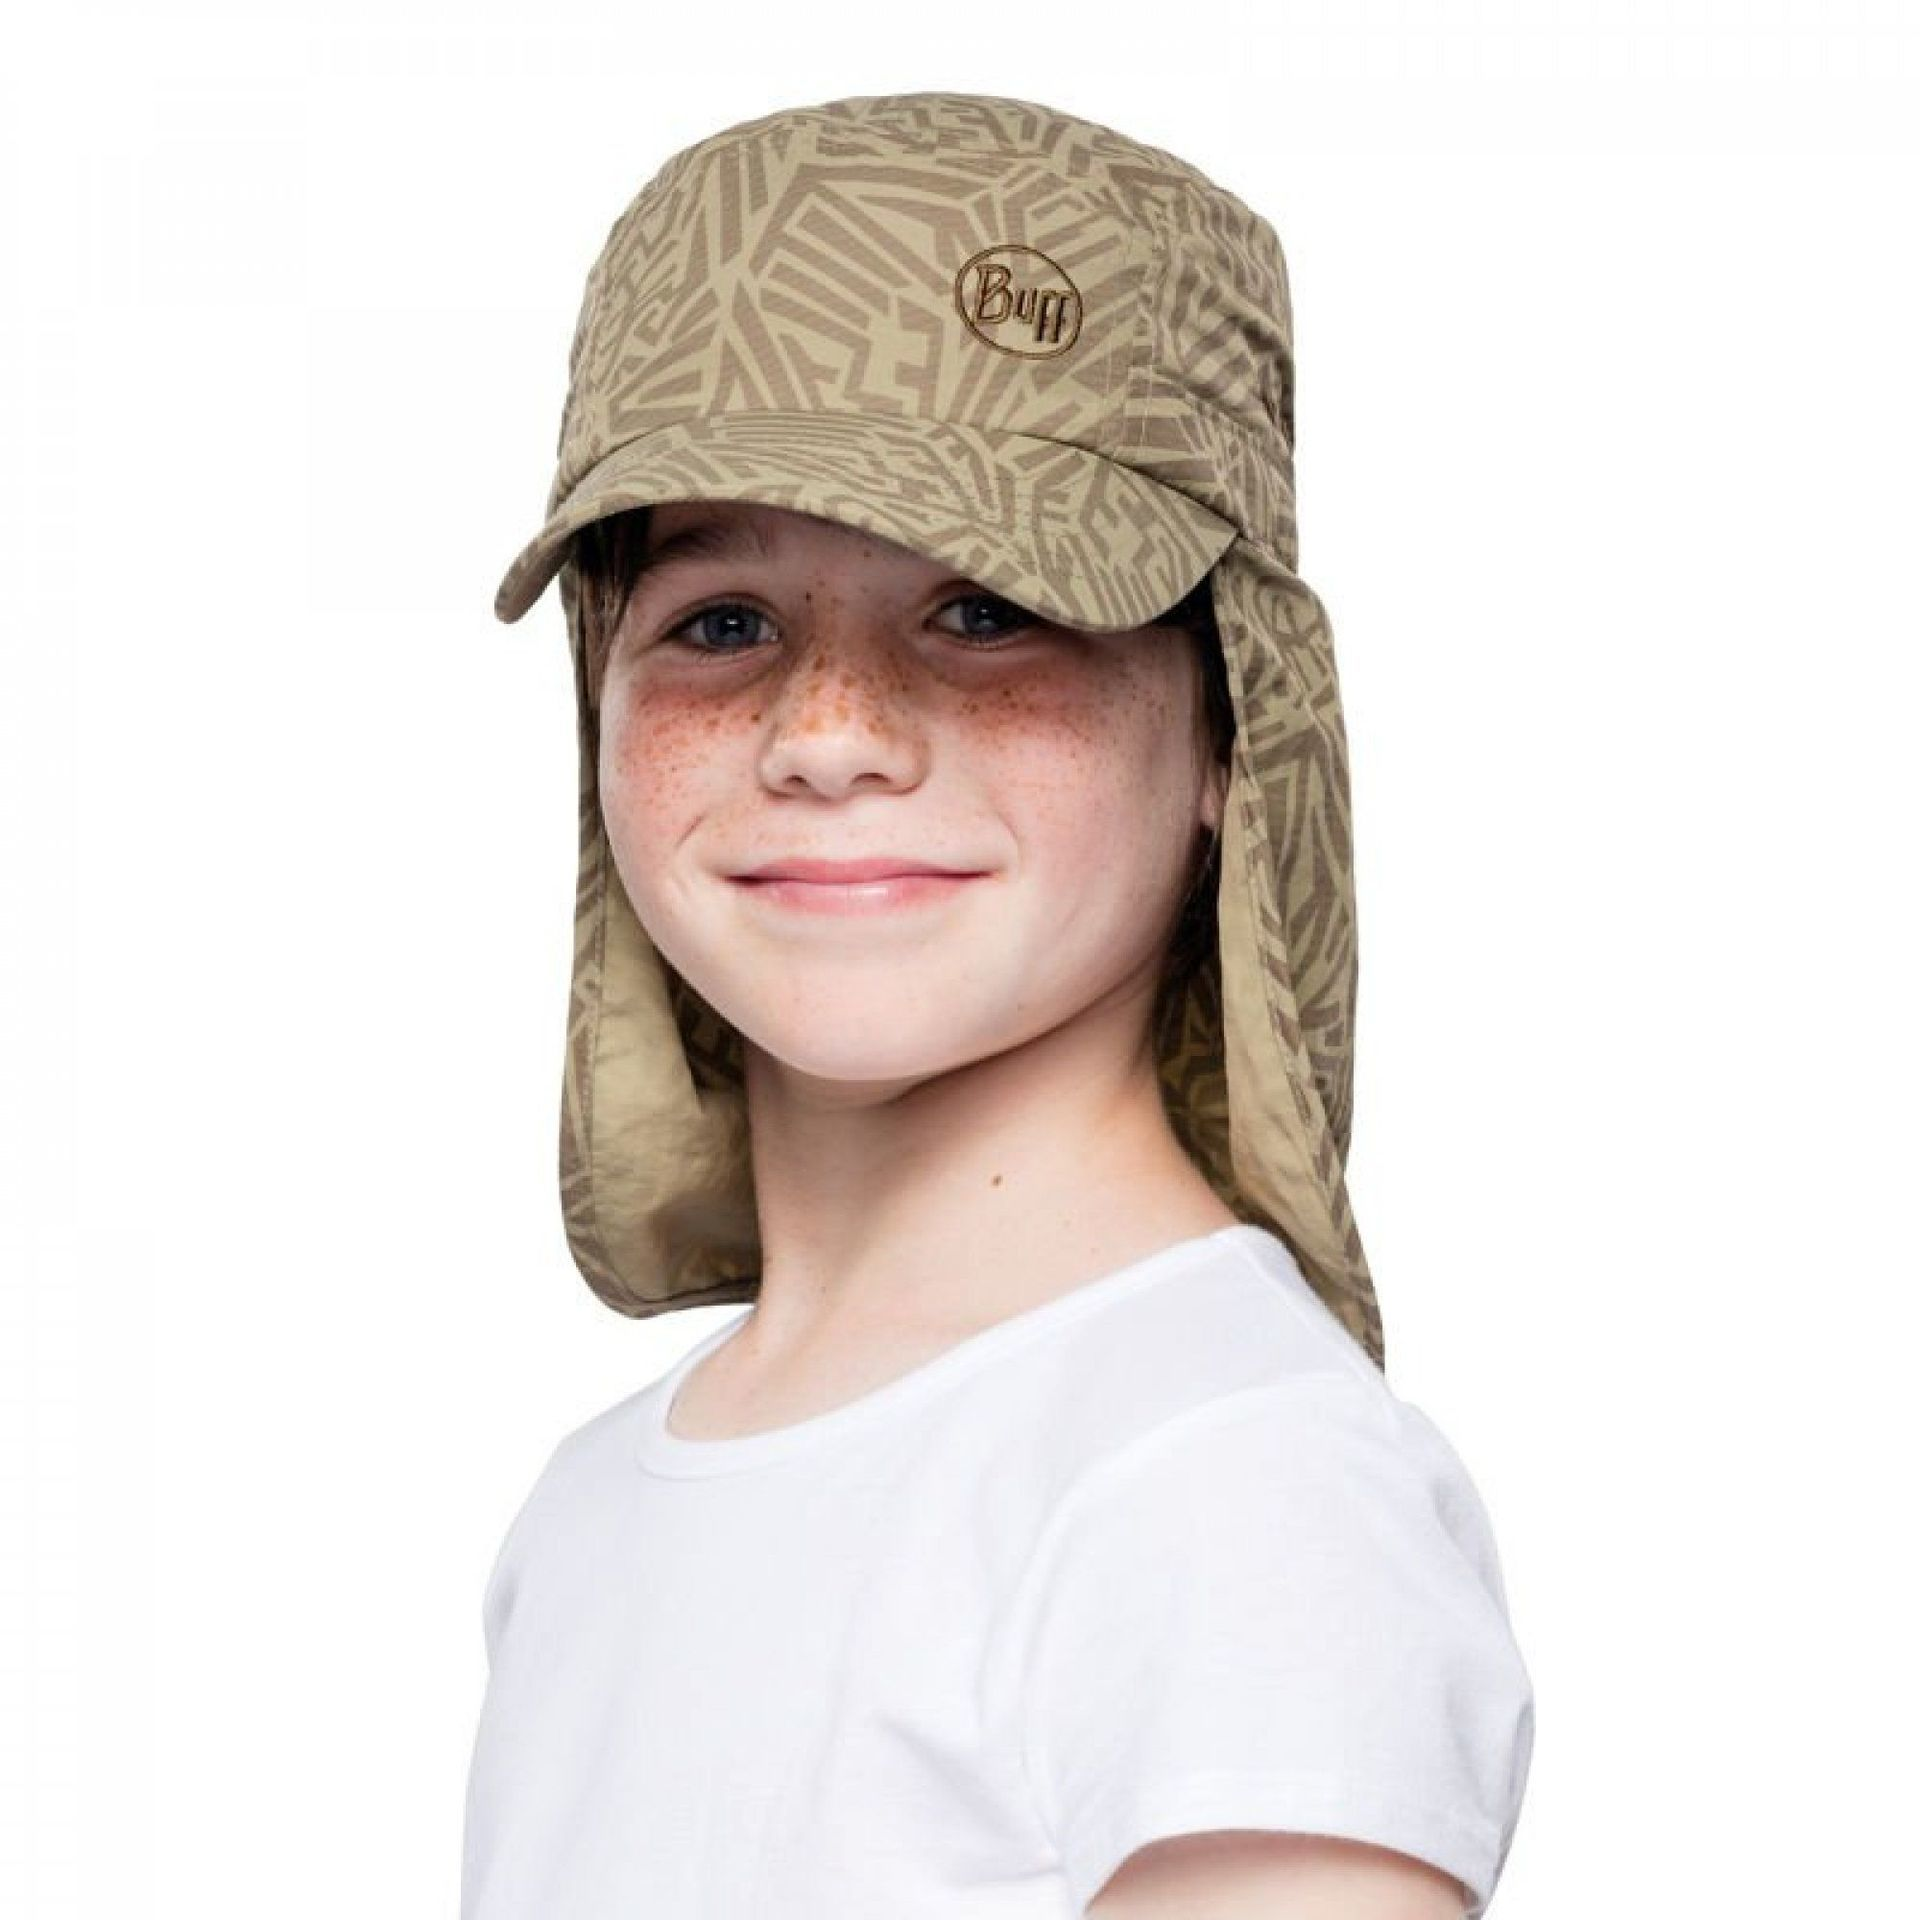 CZAPKA BUFF BIMINI CAP JR STONY BRINDLE 2